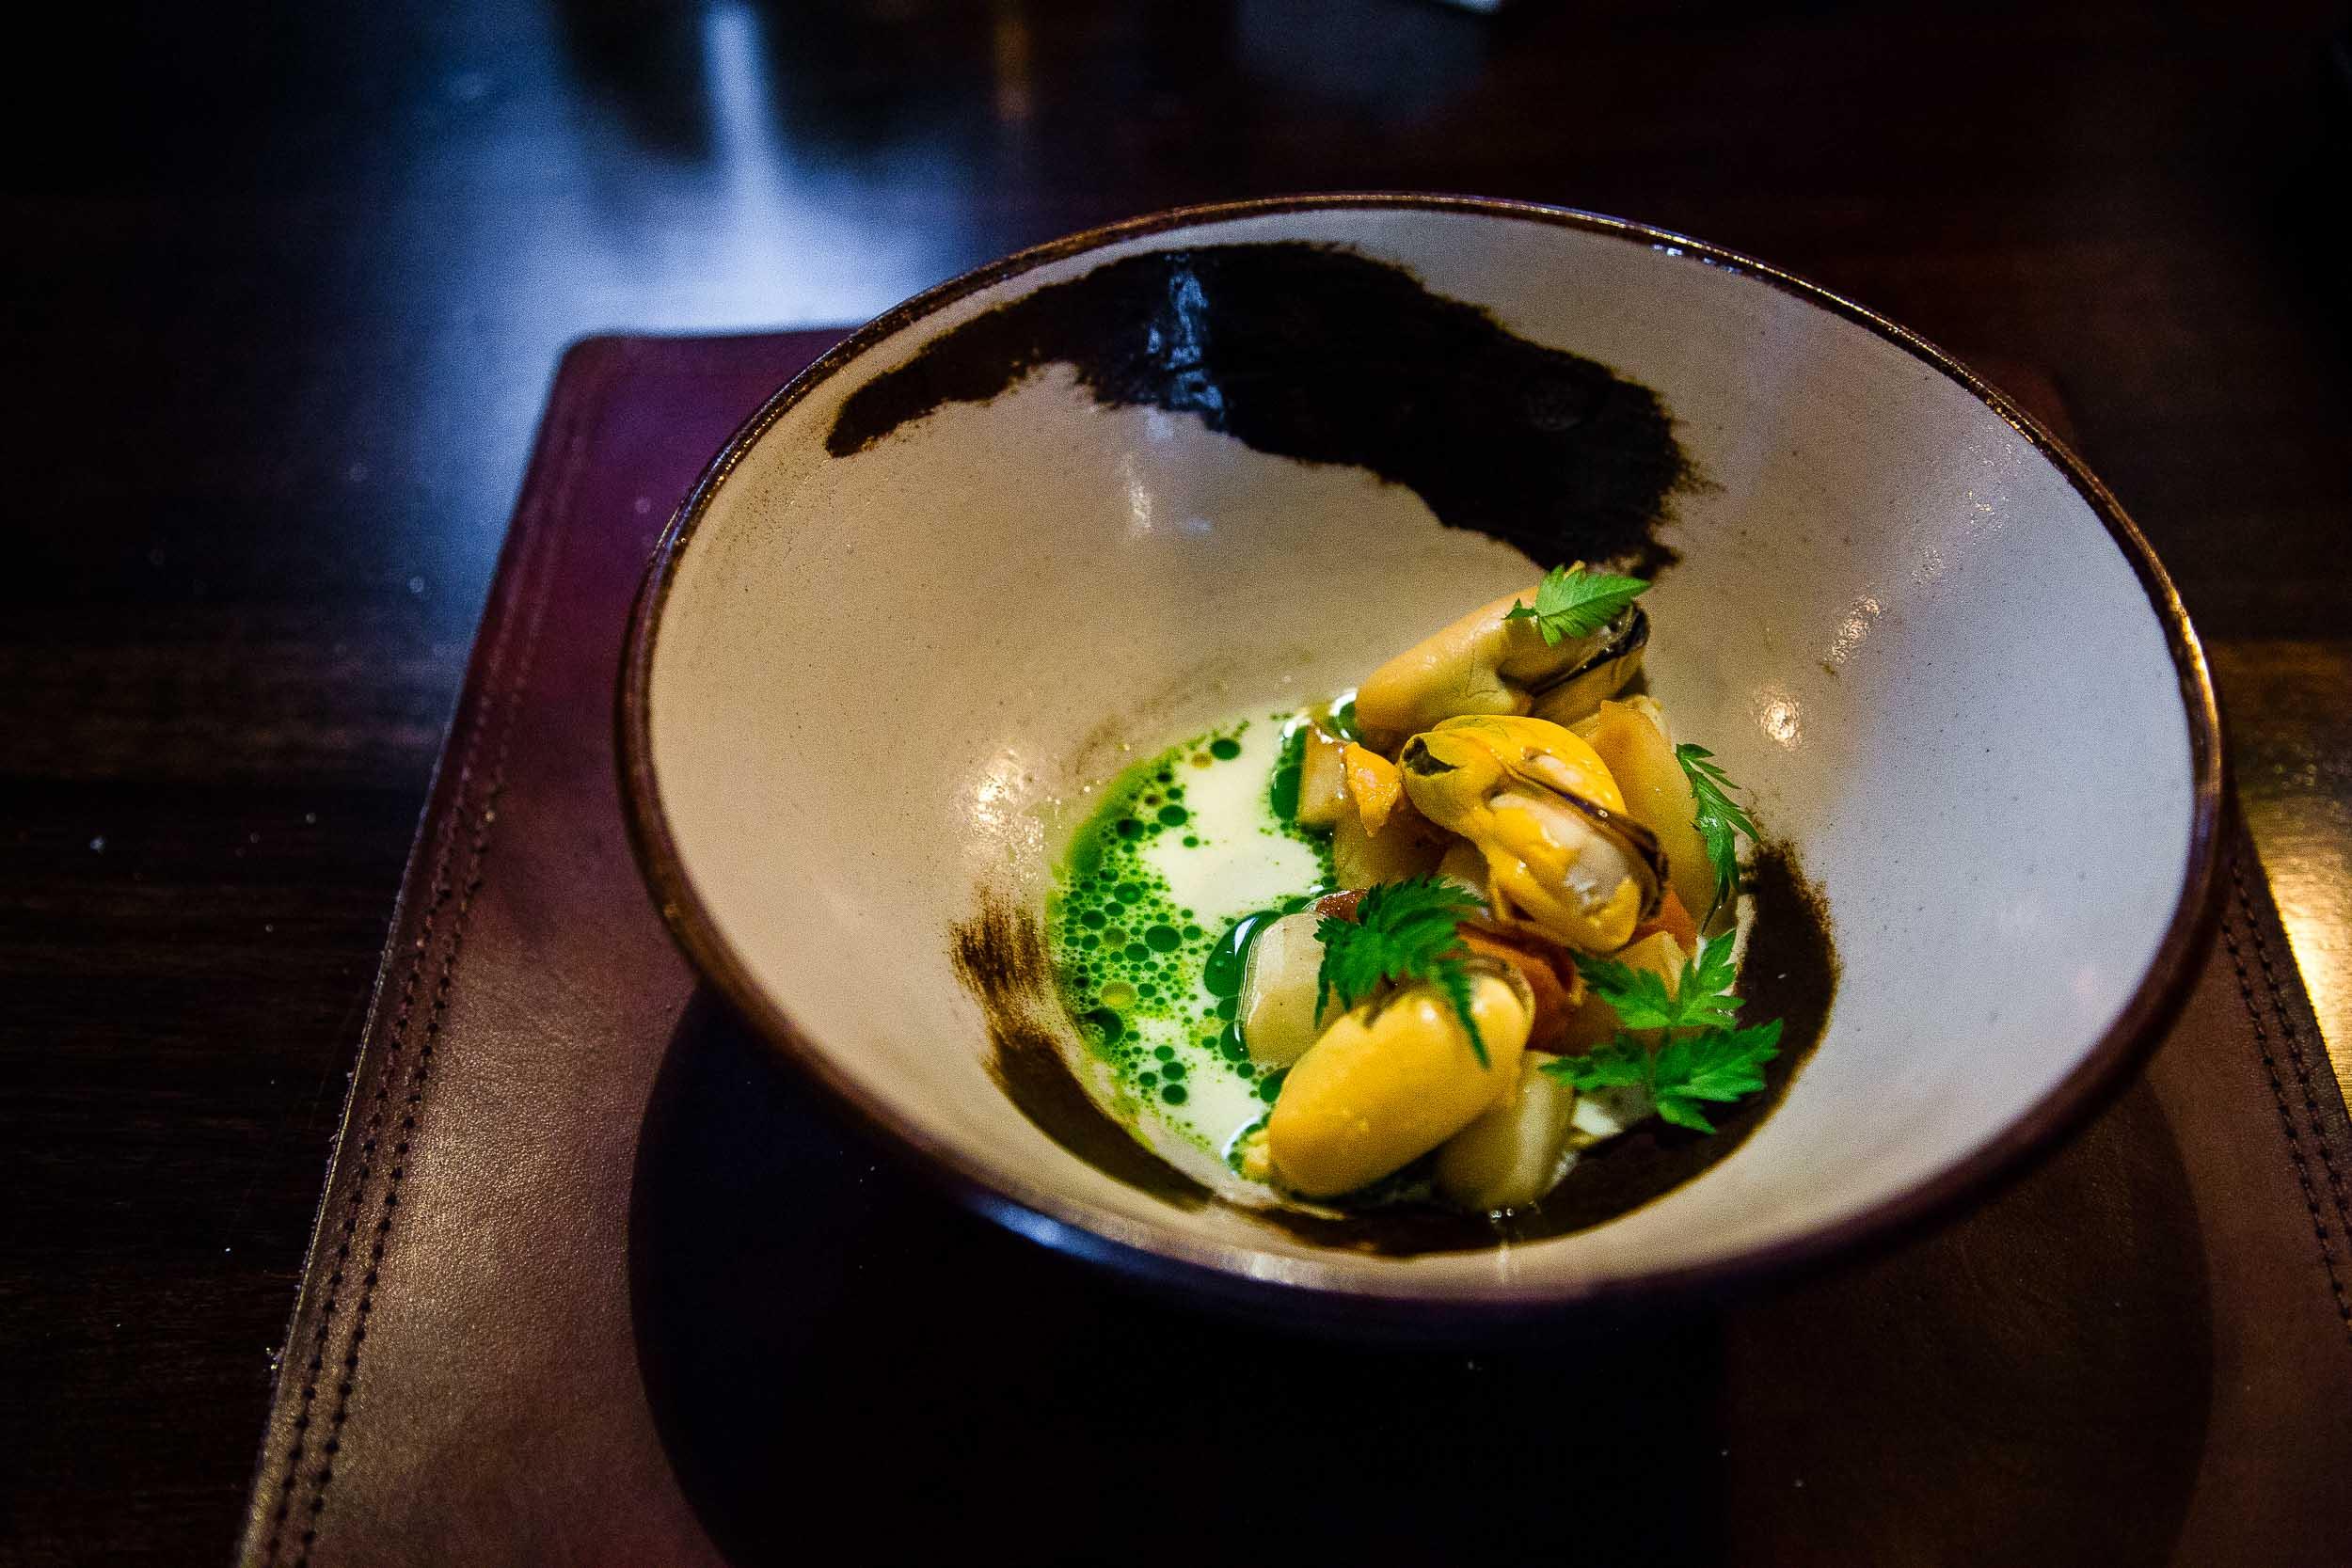 Blue mussels, blue mussel cream, root vegetables, parsley